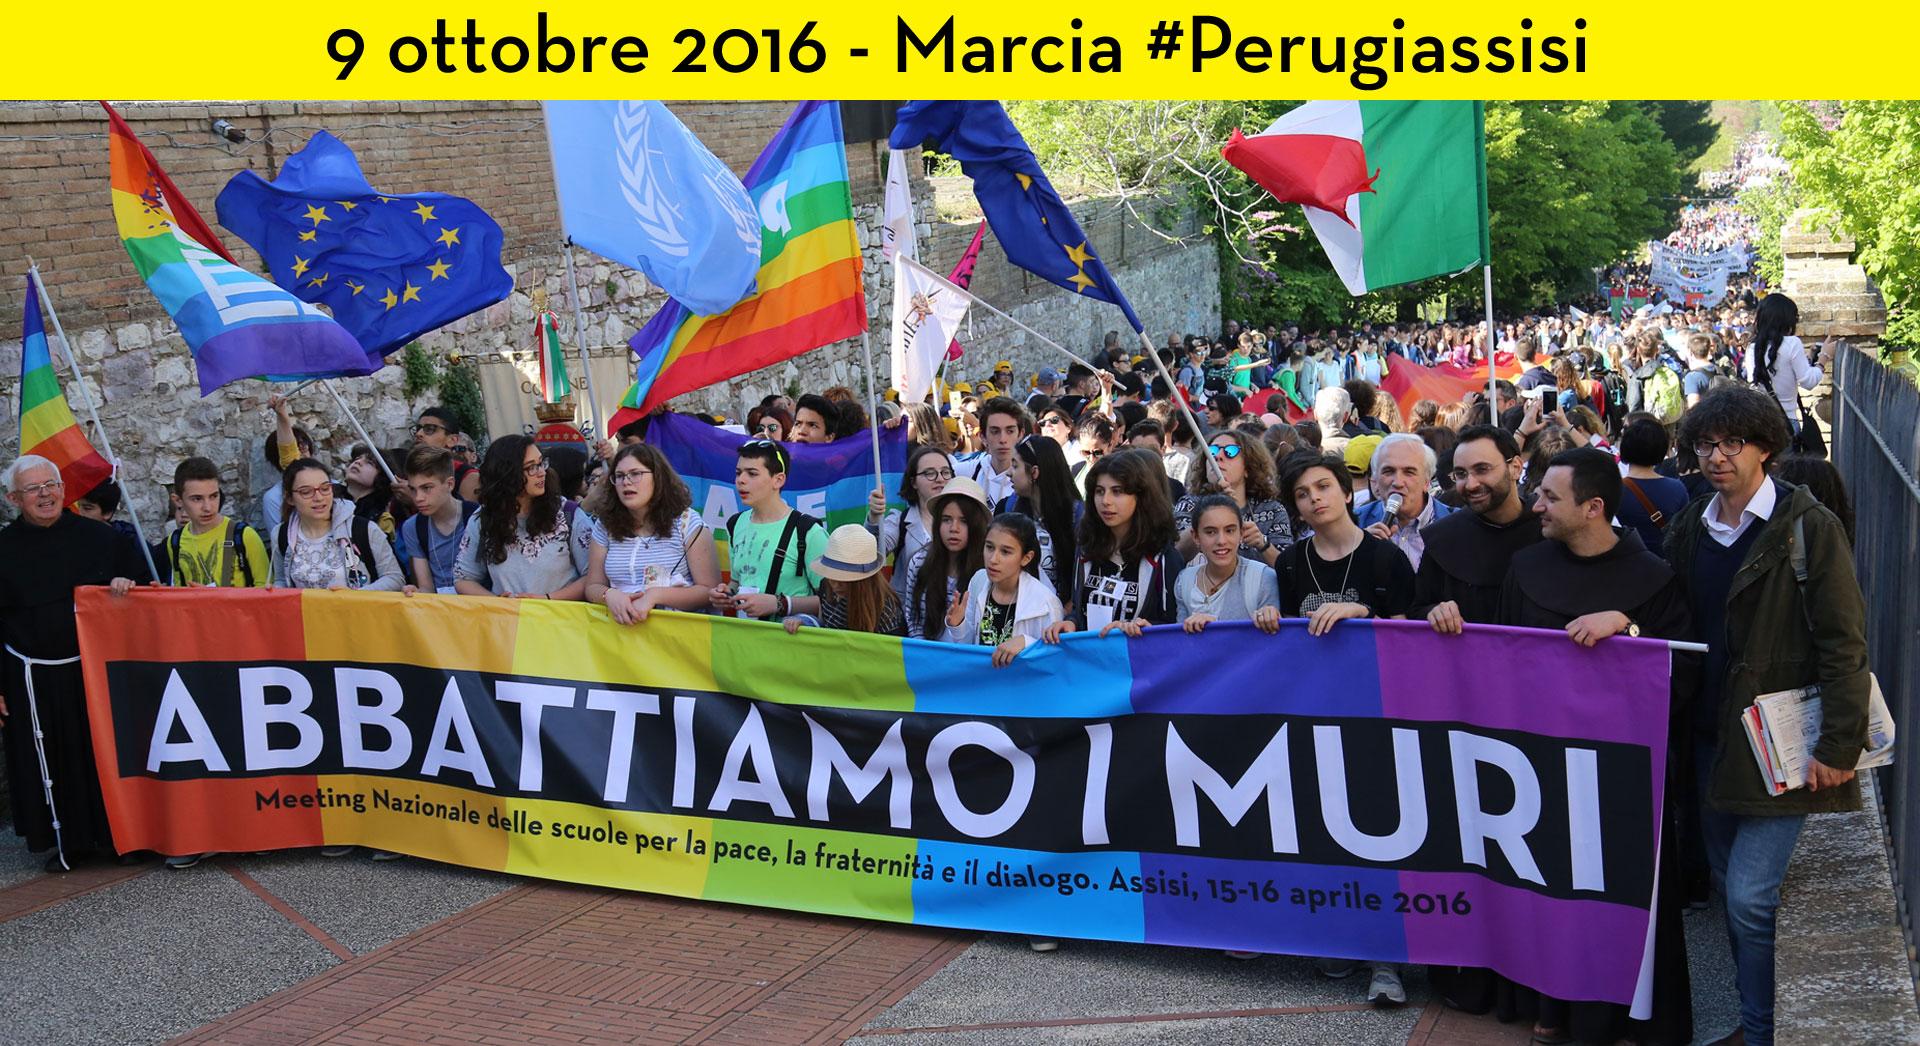 Marcia per la pace Perugia-Assisi, 9 ottobre